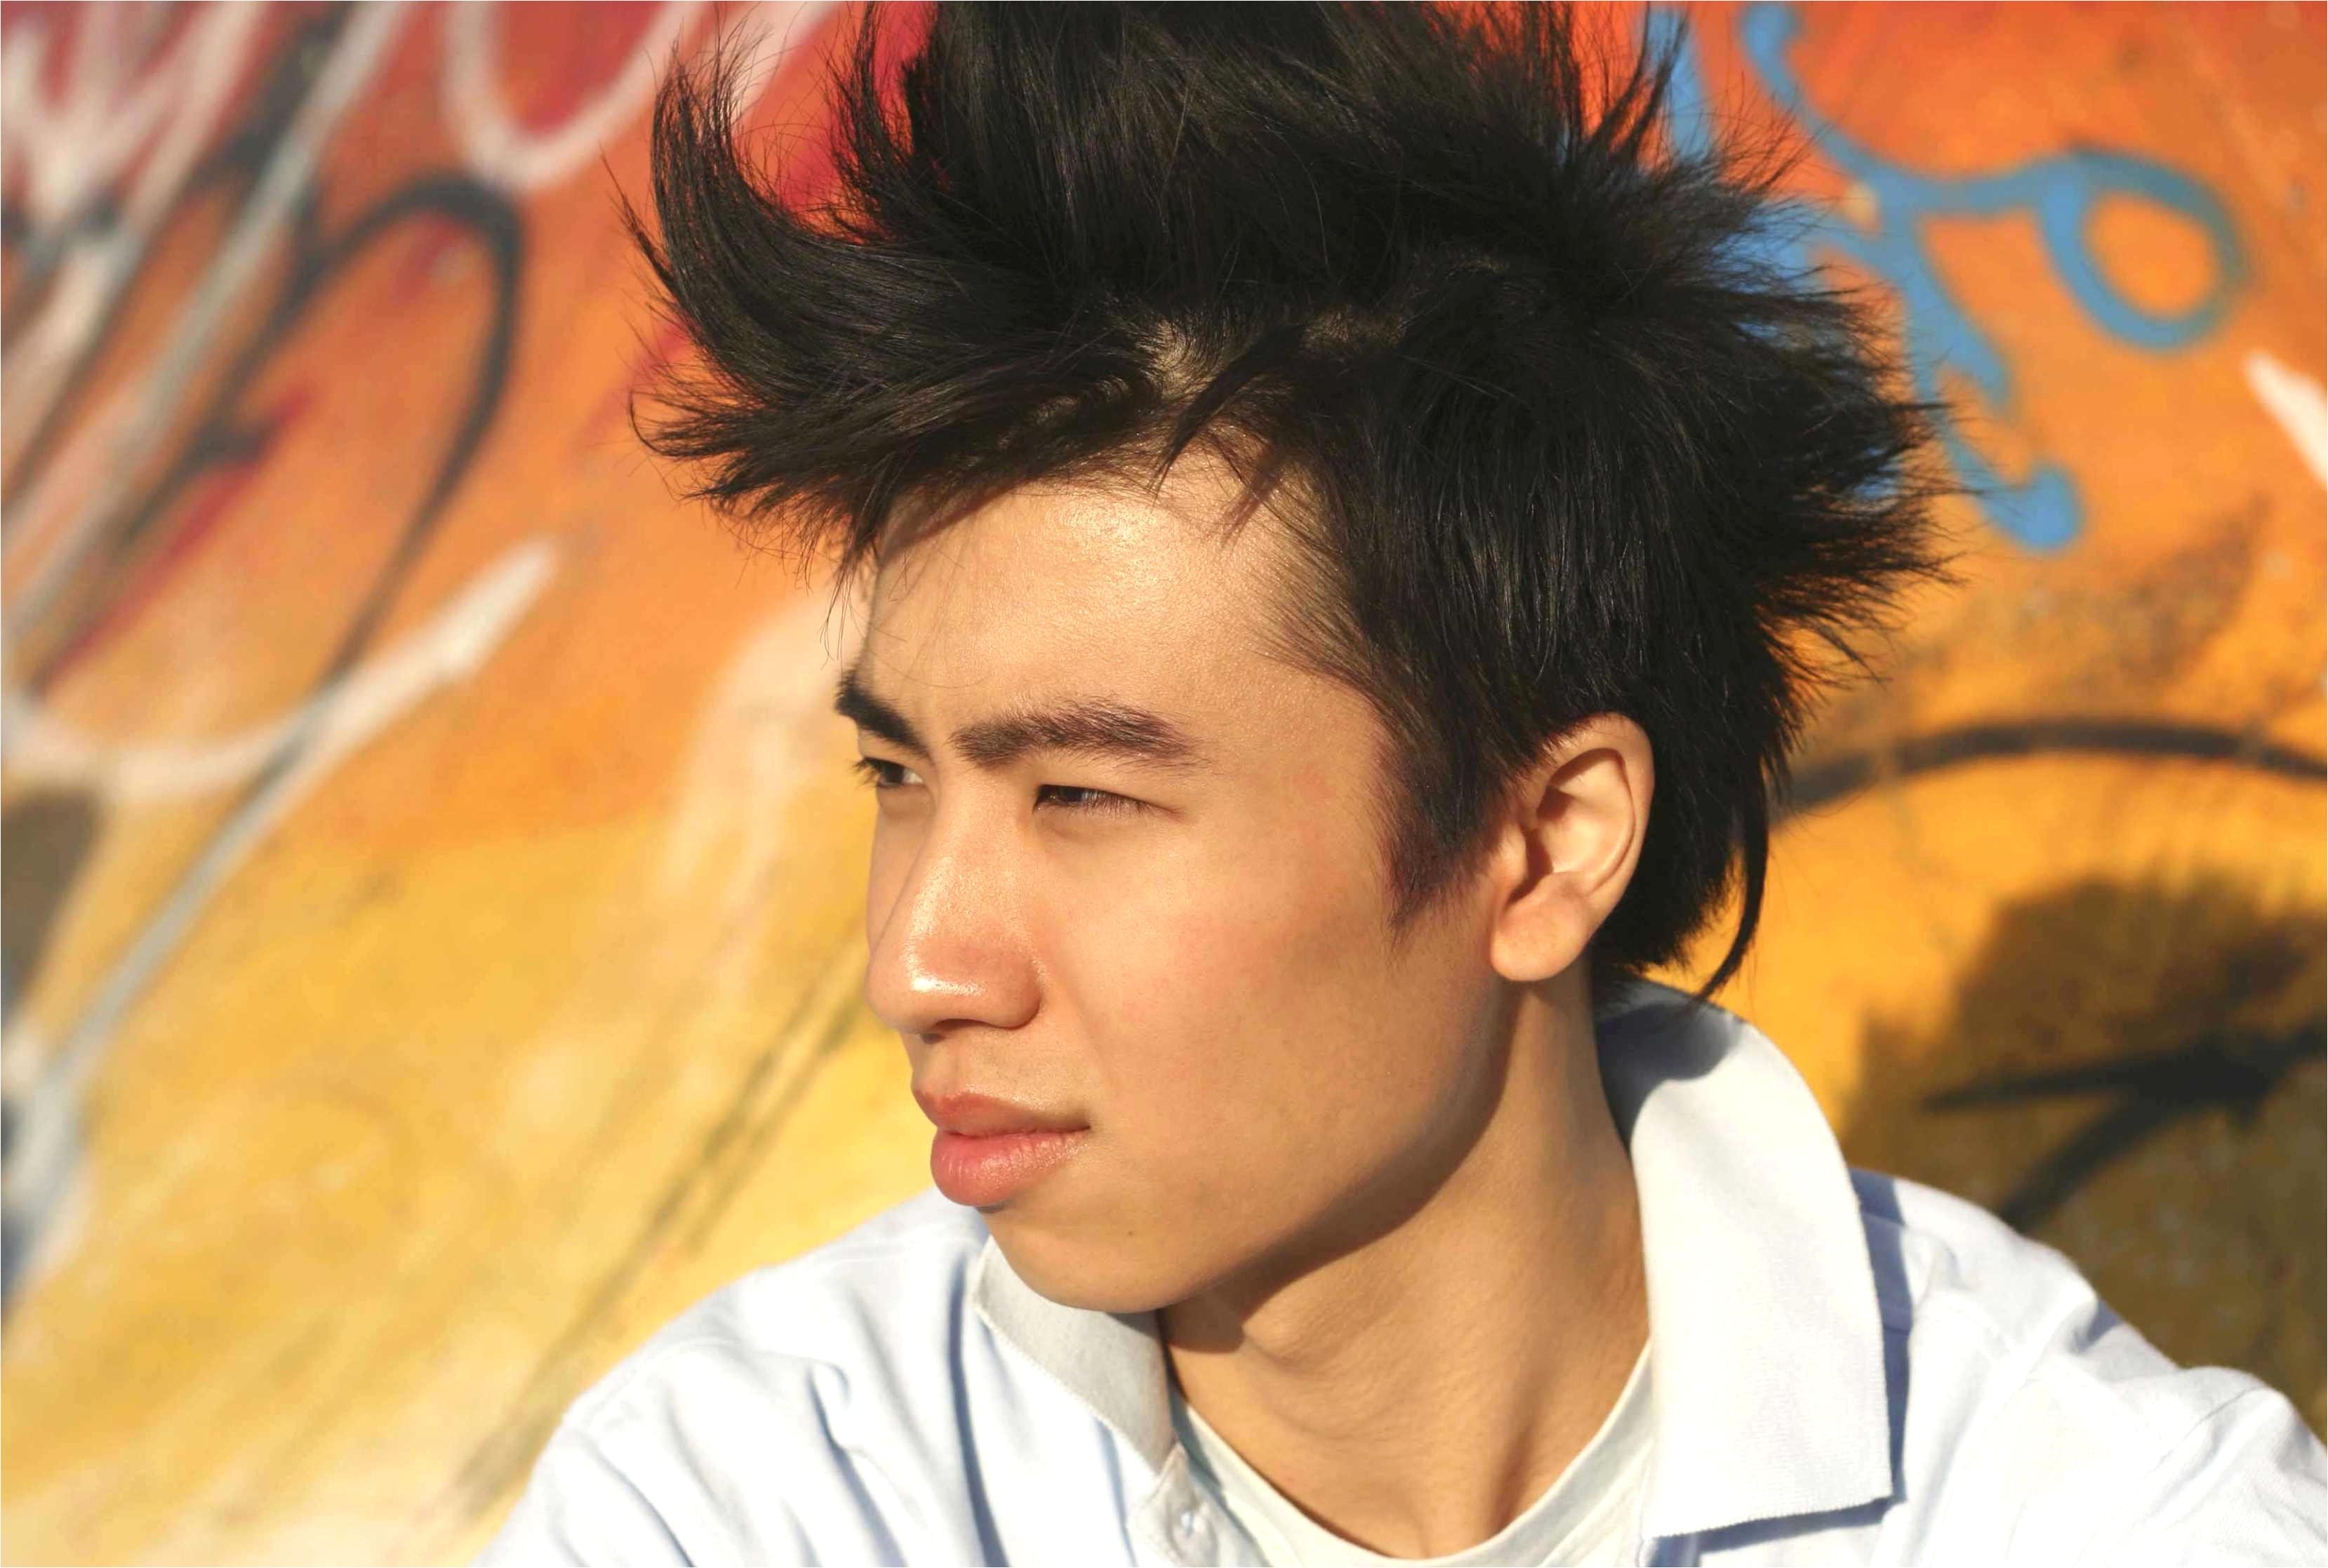 Short Dreadlock Hairstyles for Guys Beautiful Mens Short Hairstyle Fresh Cool Devil 26 3bs Haircut 0d